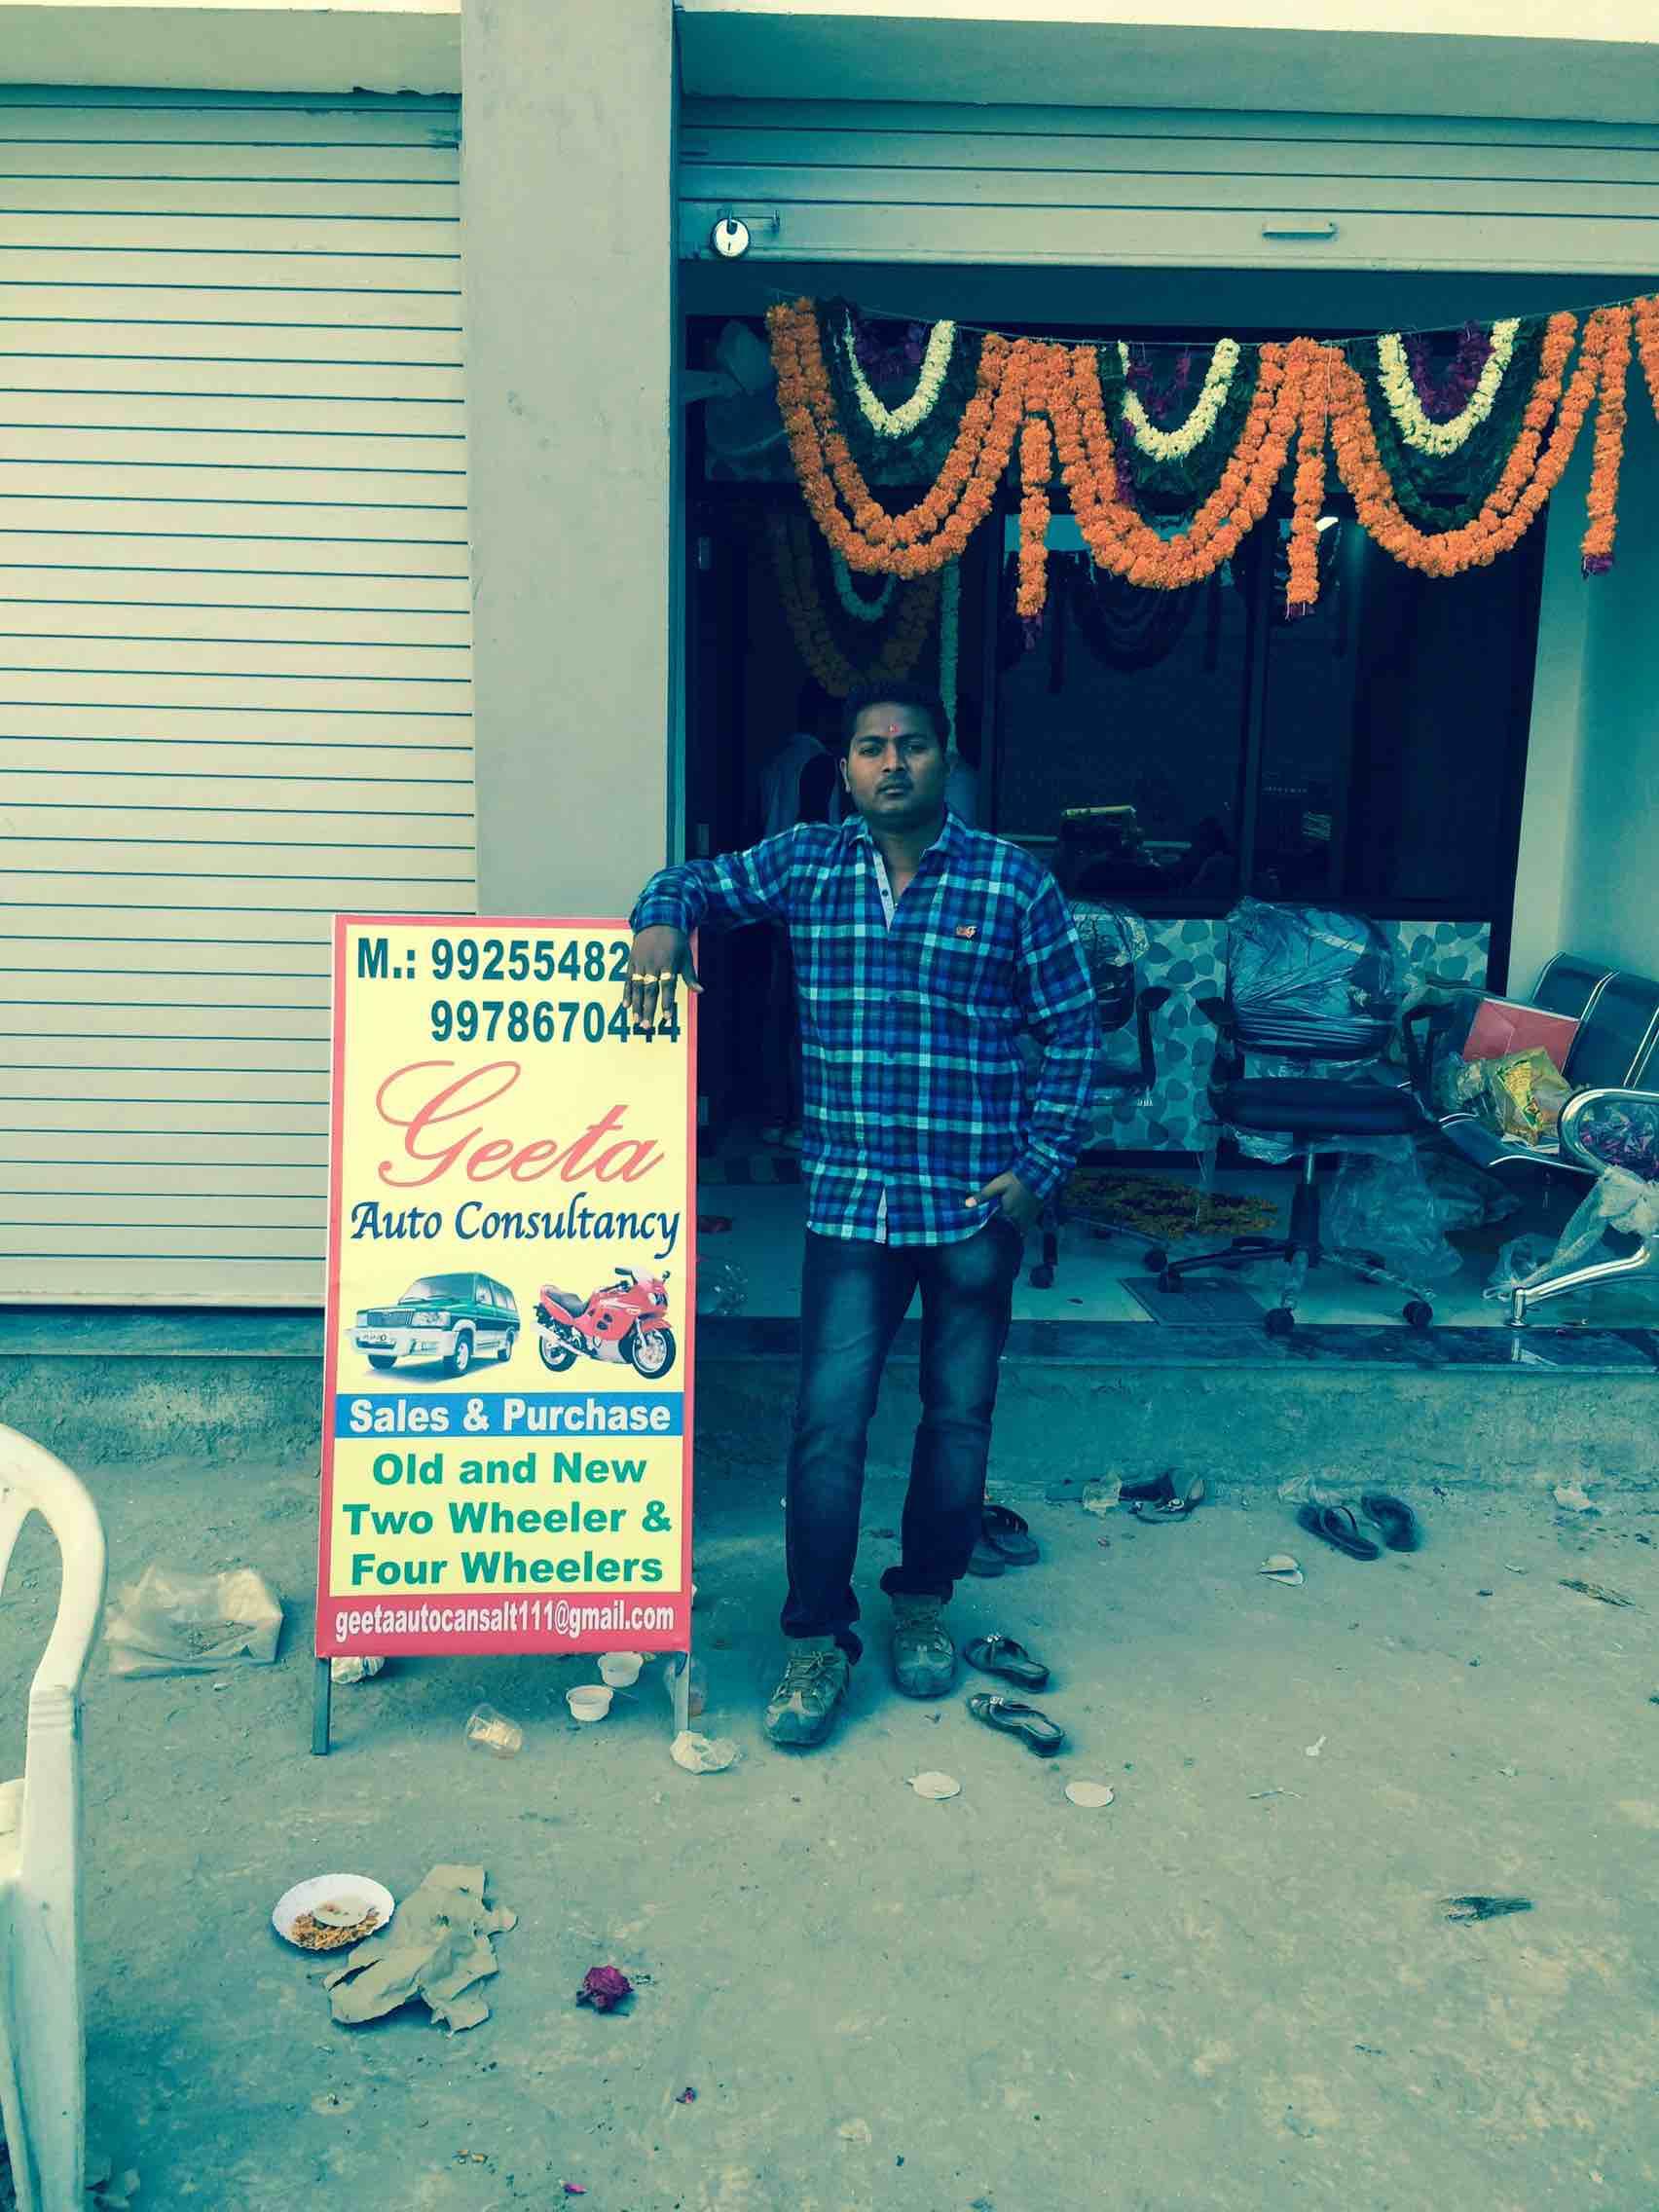 Geeta Auto consultancy